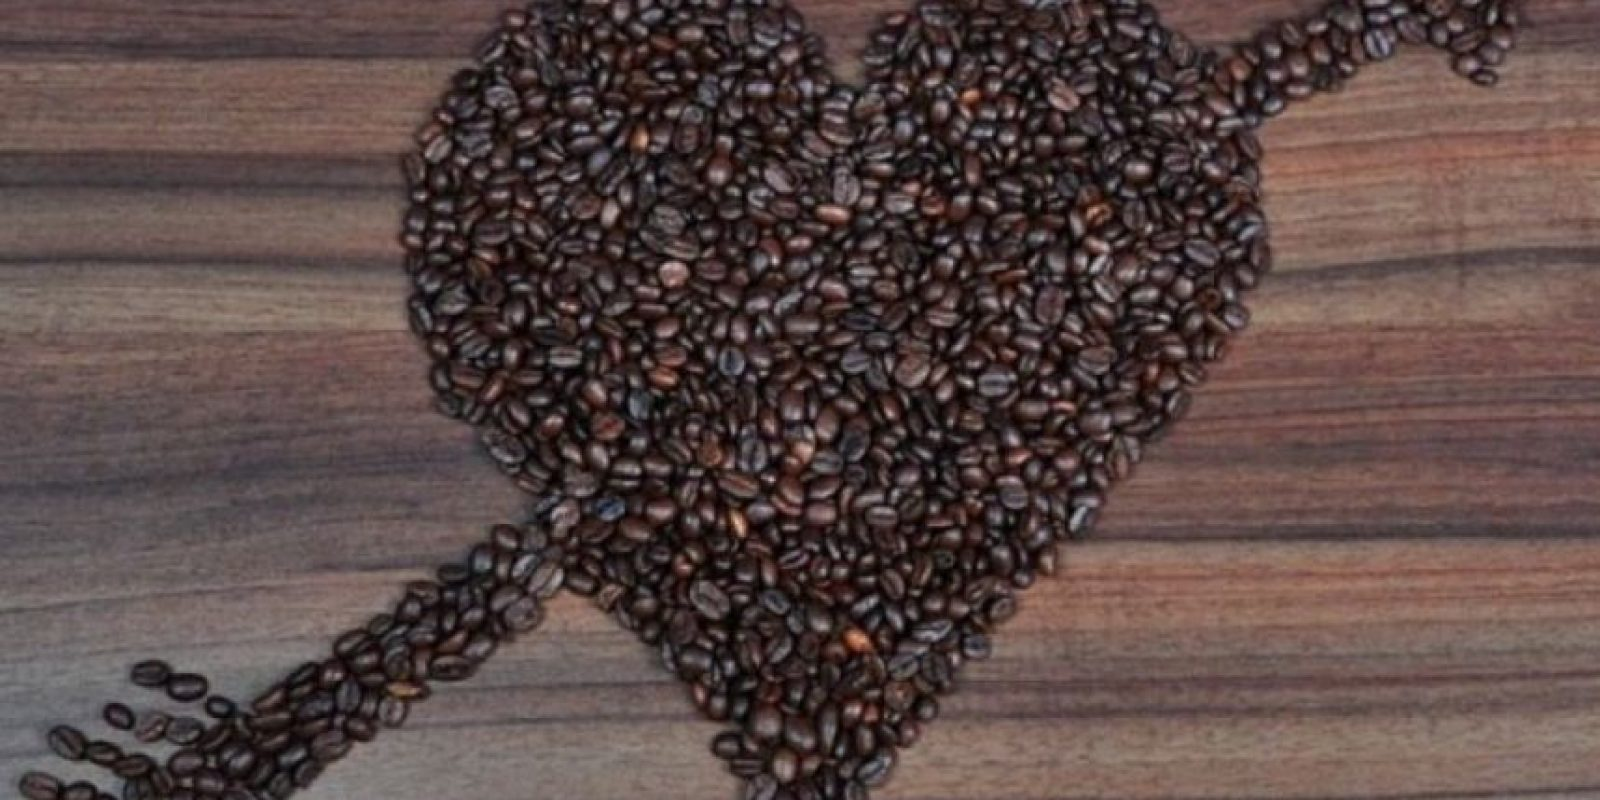 3. El amor nos protege de enfermedades. Foto:Tumblr